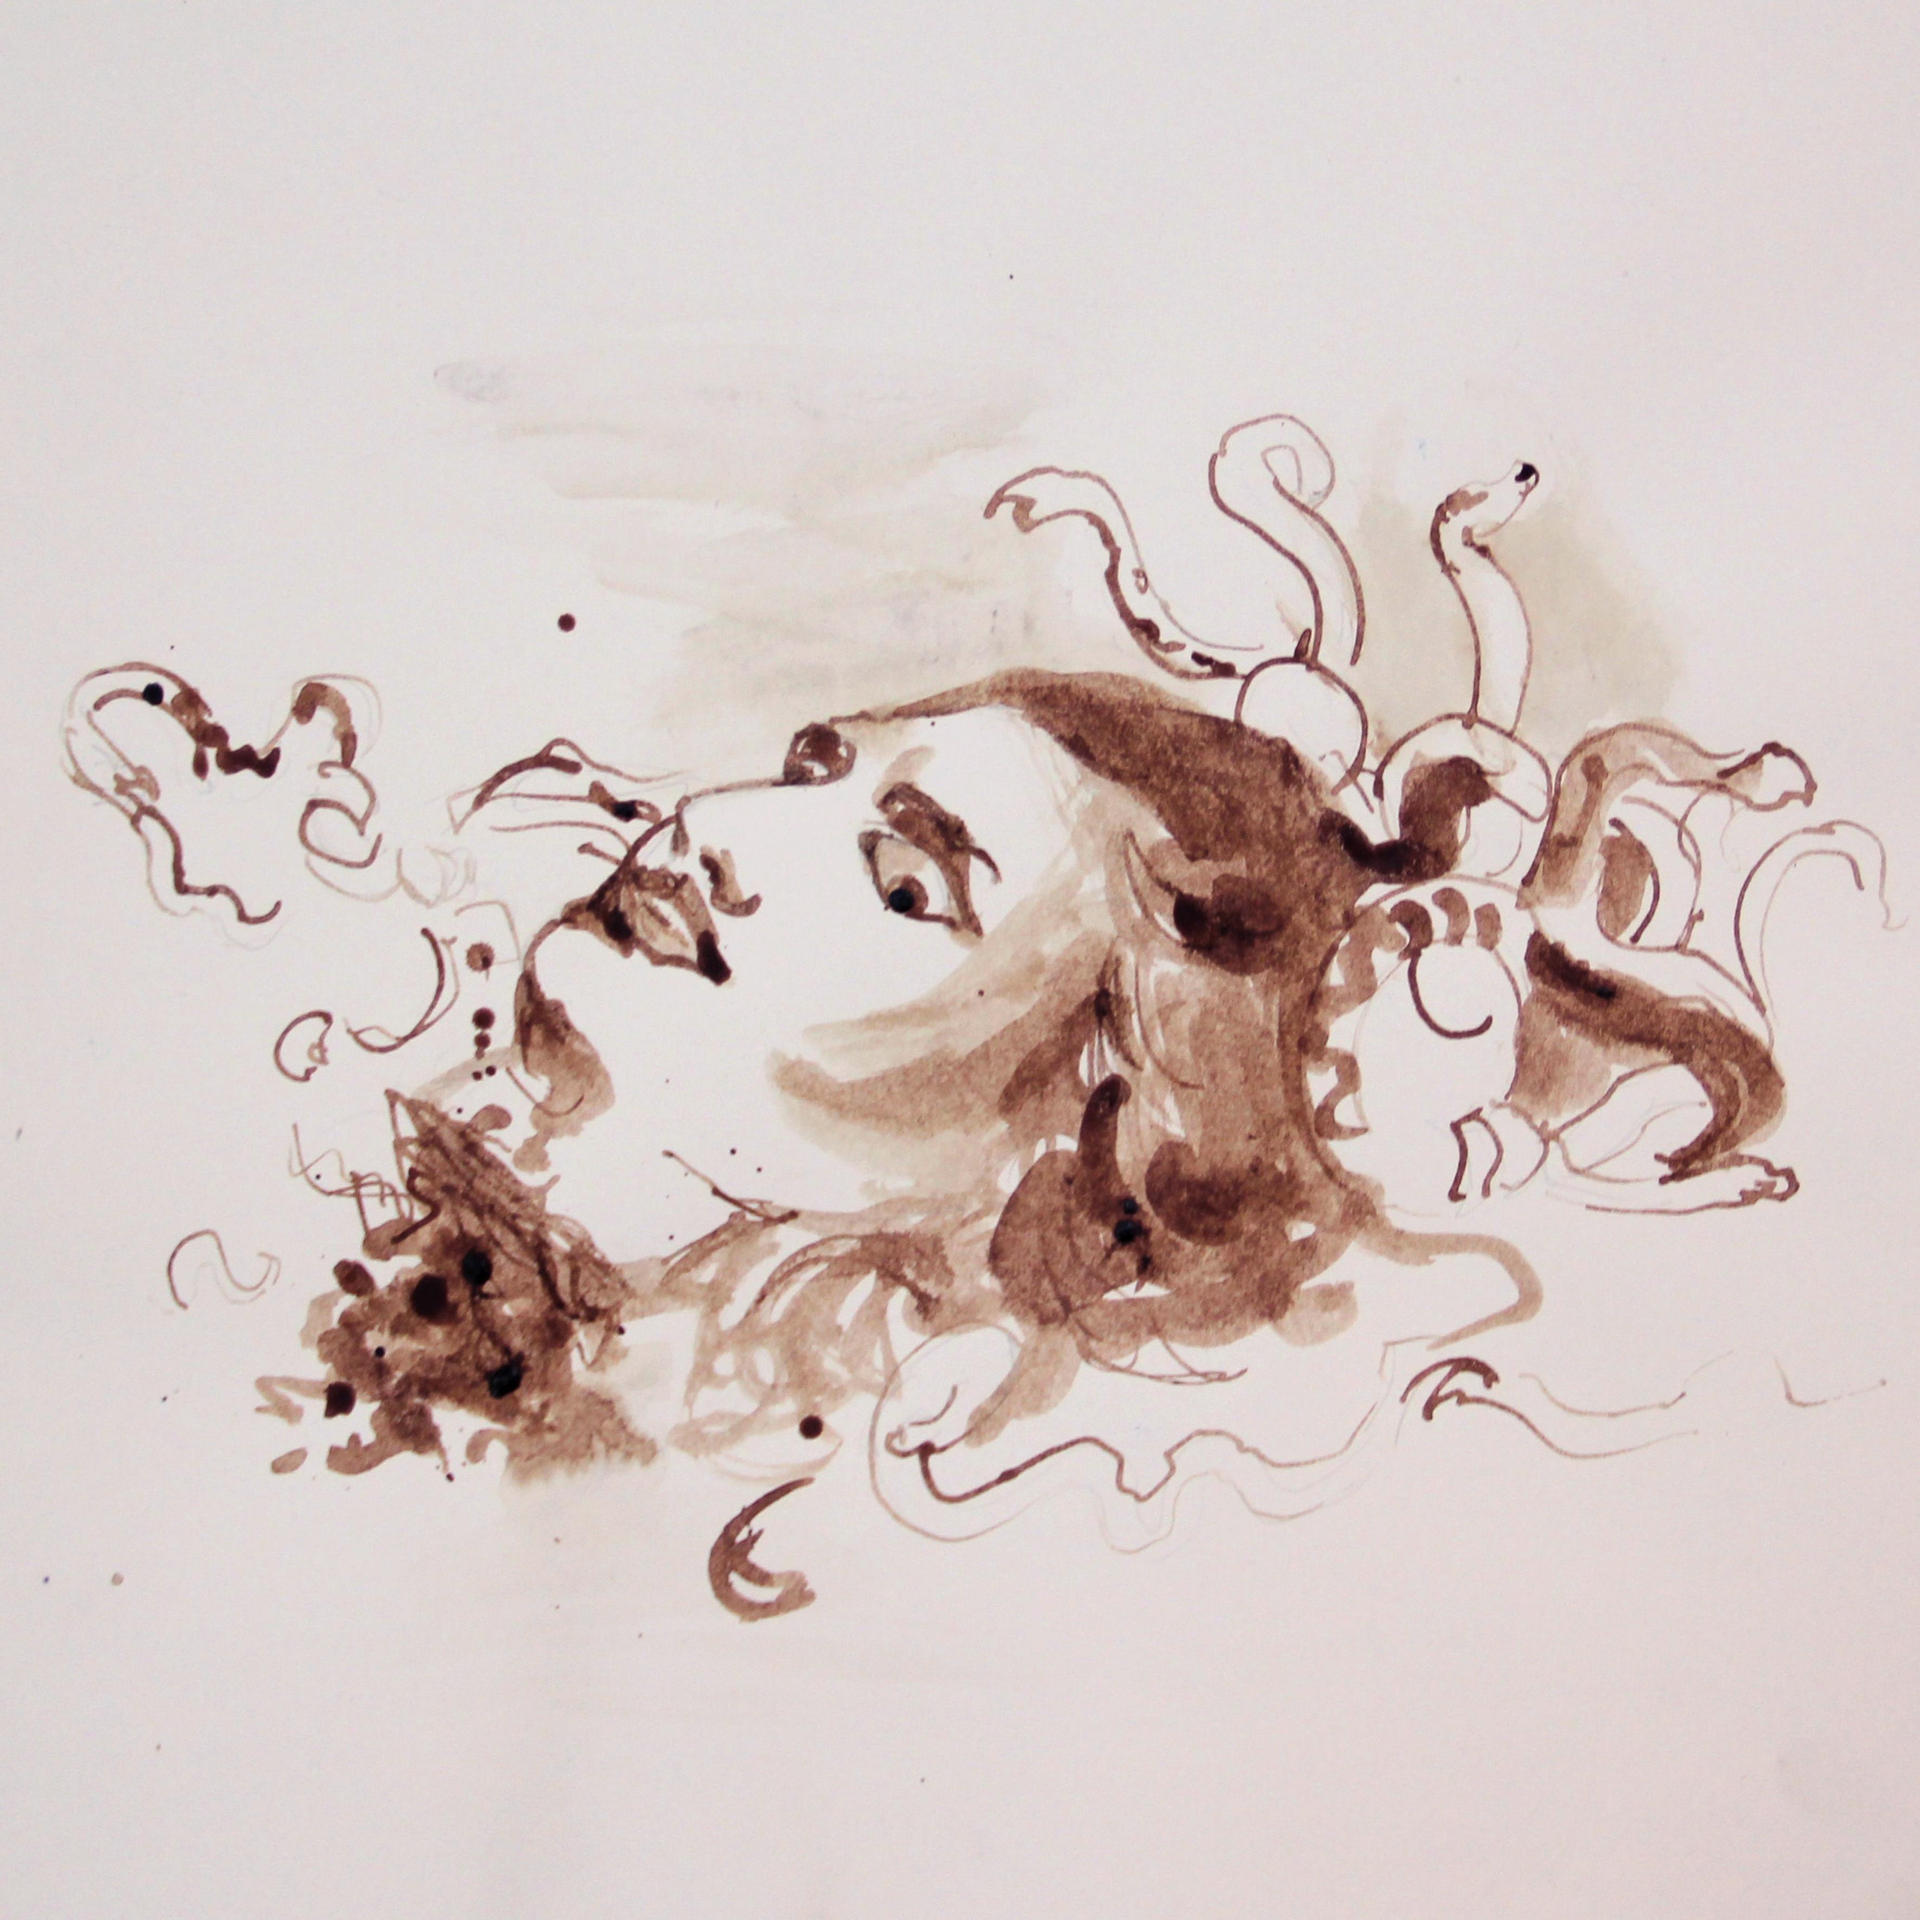 Sapir Gal ספיר גל, drawing, The Head of Medusa, blood